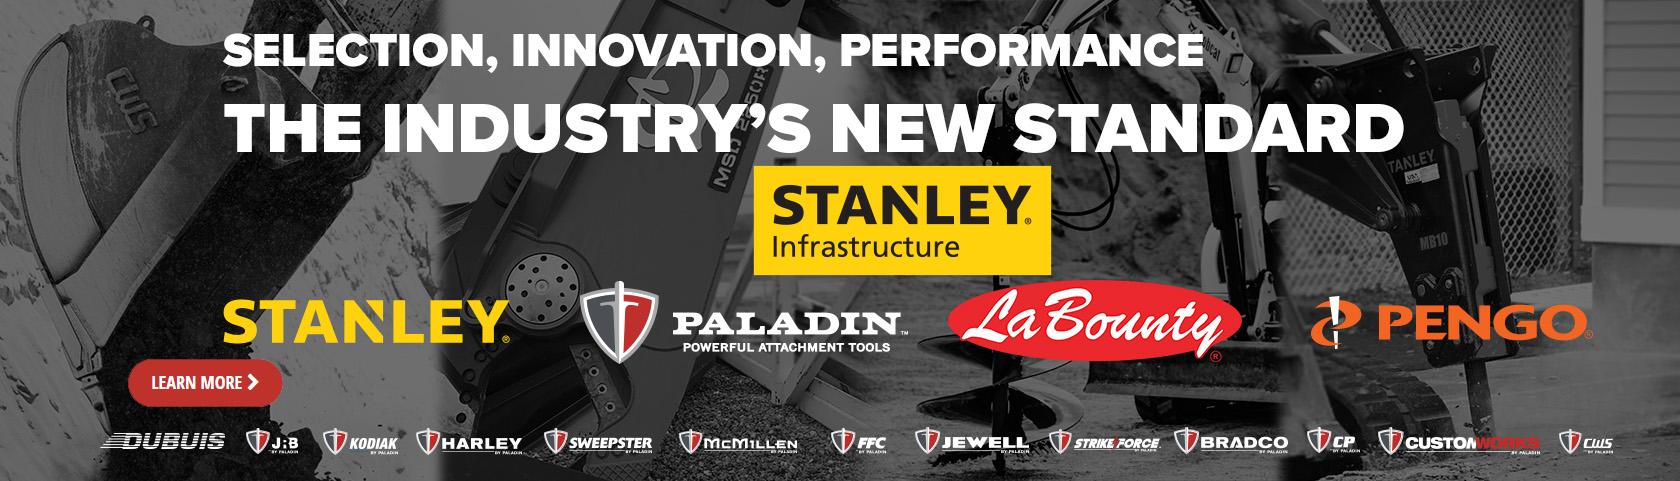 Sheyenne Tooling Manufacturing Universal Wiring Harness